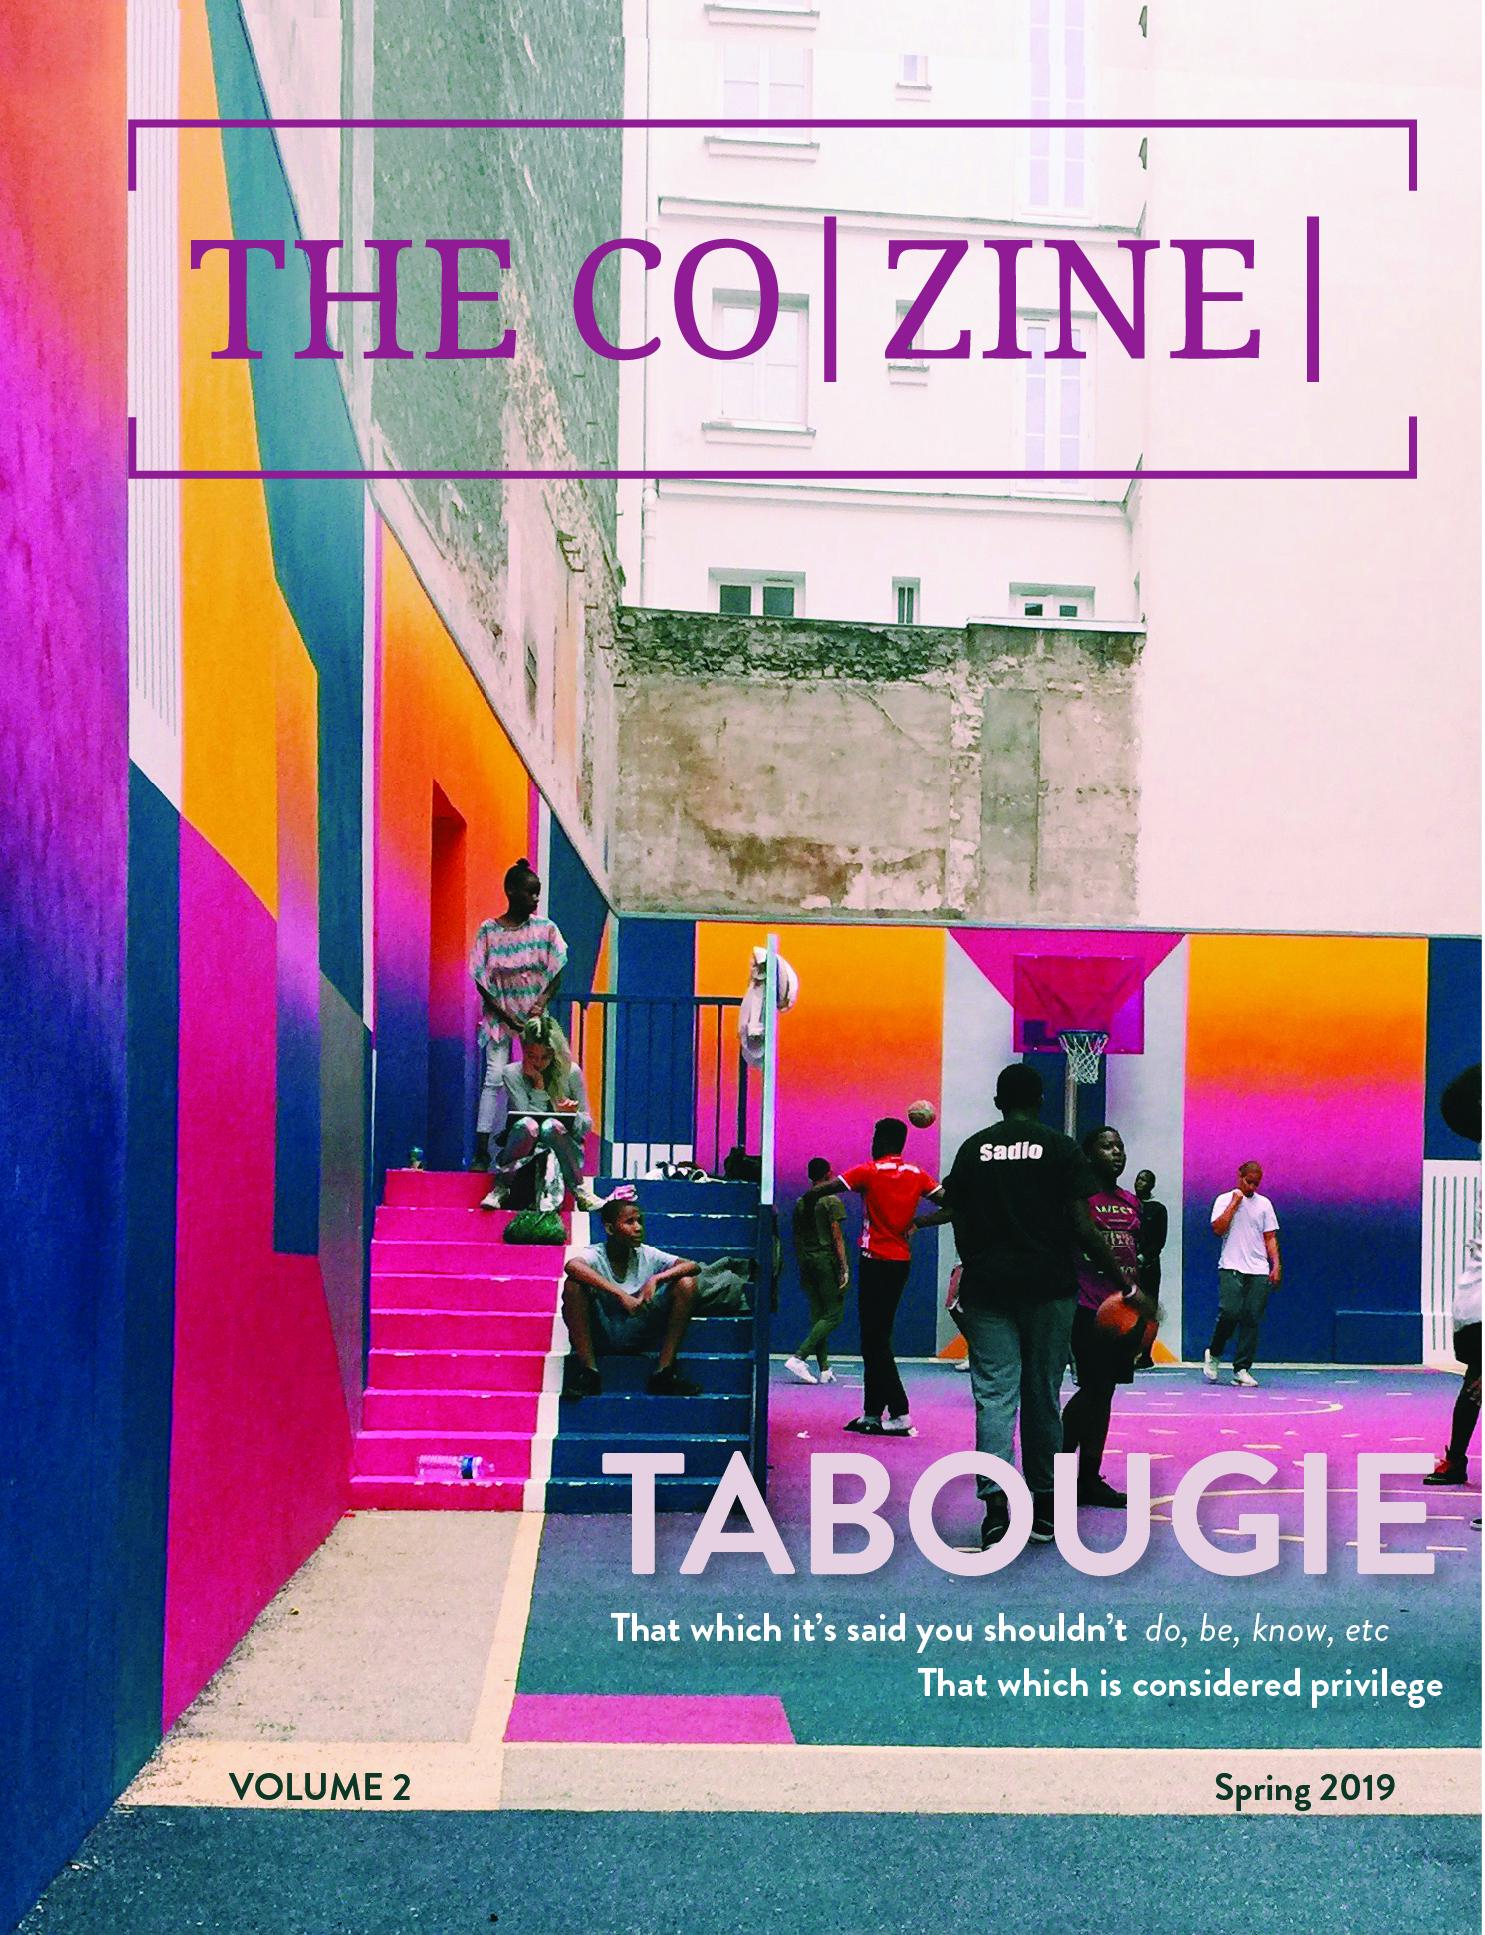 Co-Zine_Vol2_Cover_D.jpg